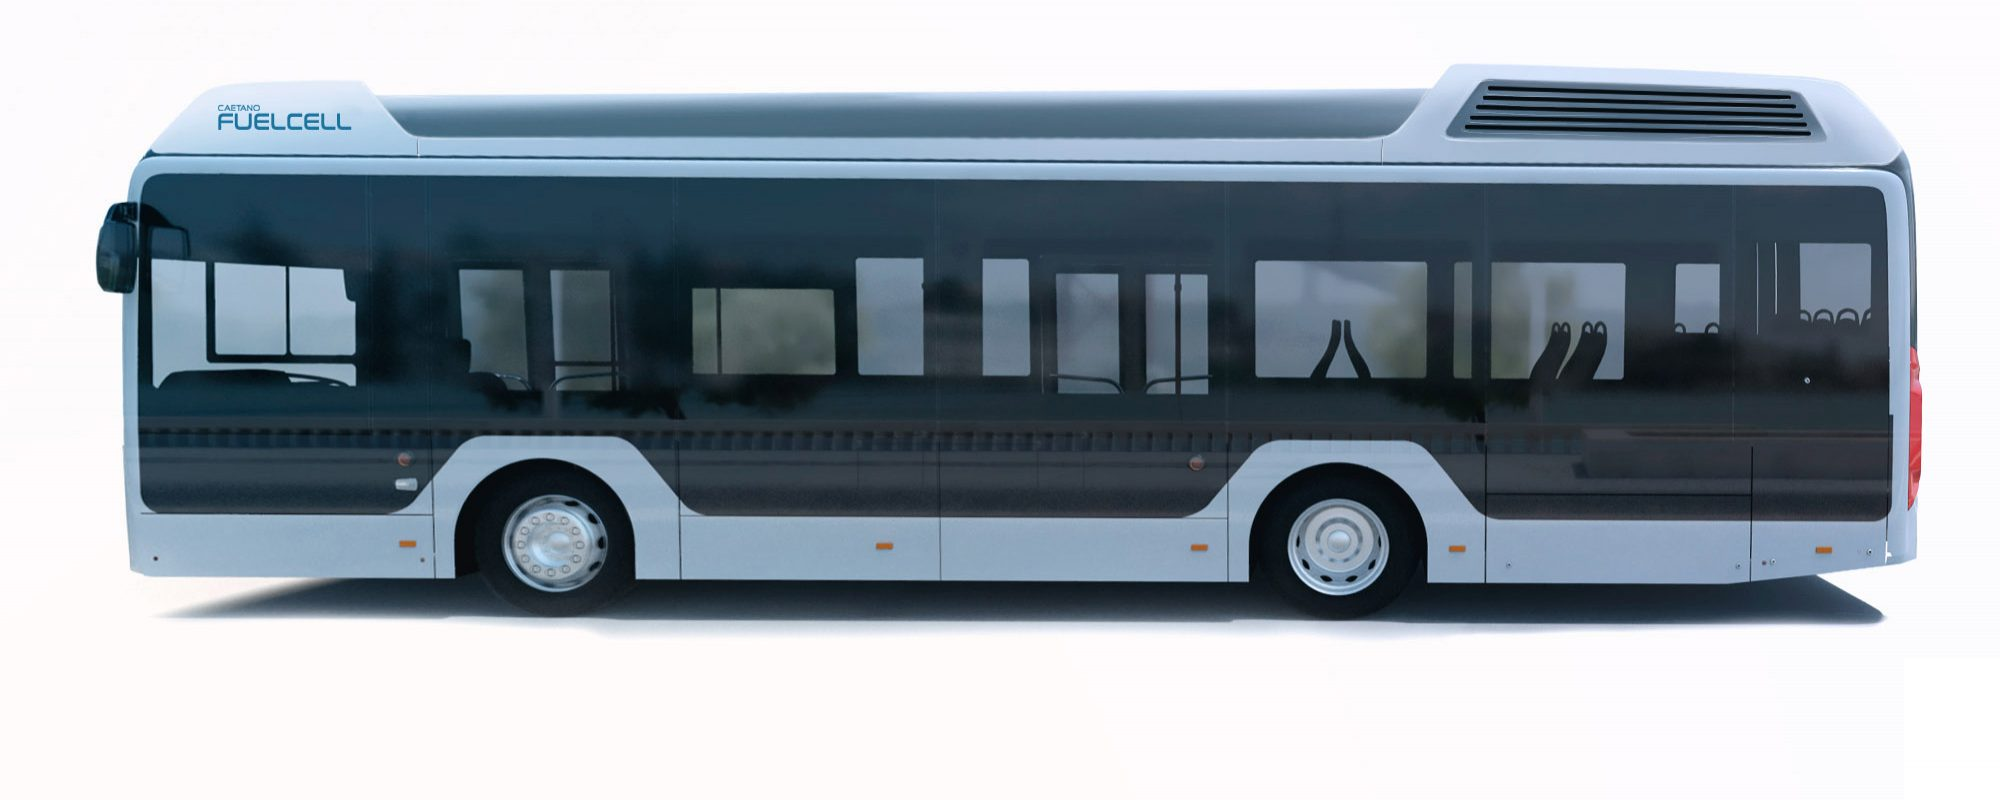 Toyota levert waterstoftechnologie aan busfabrikant Caetanobus SA uit Portugal